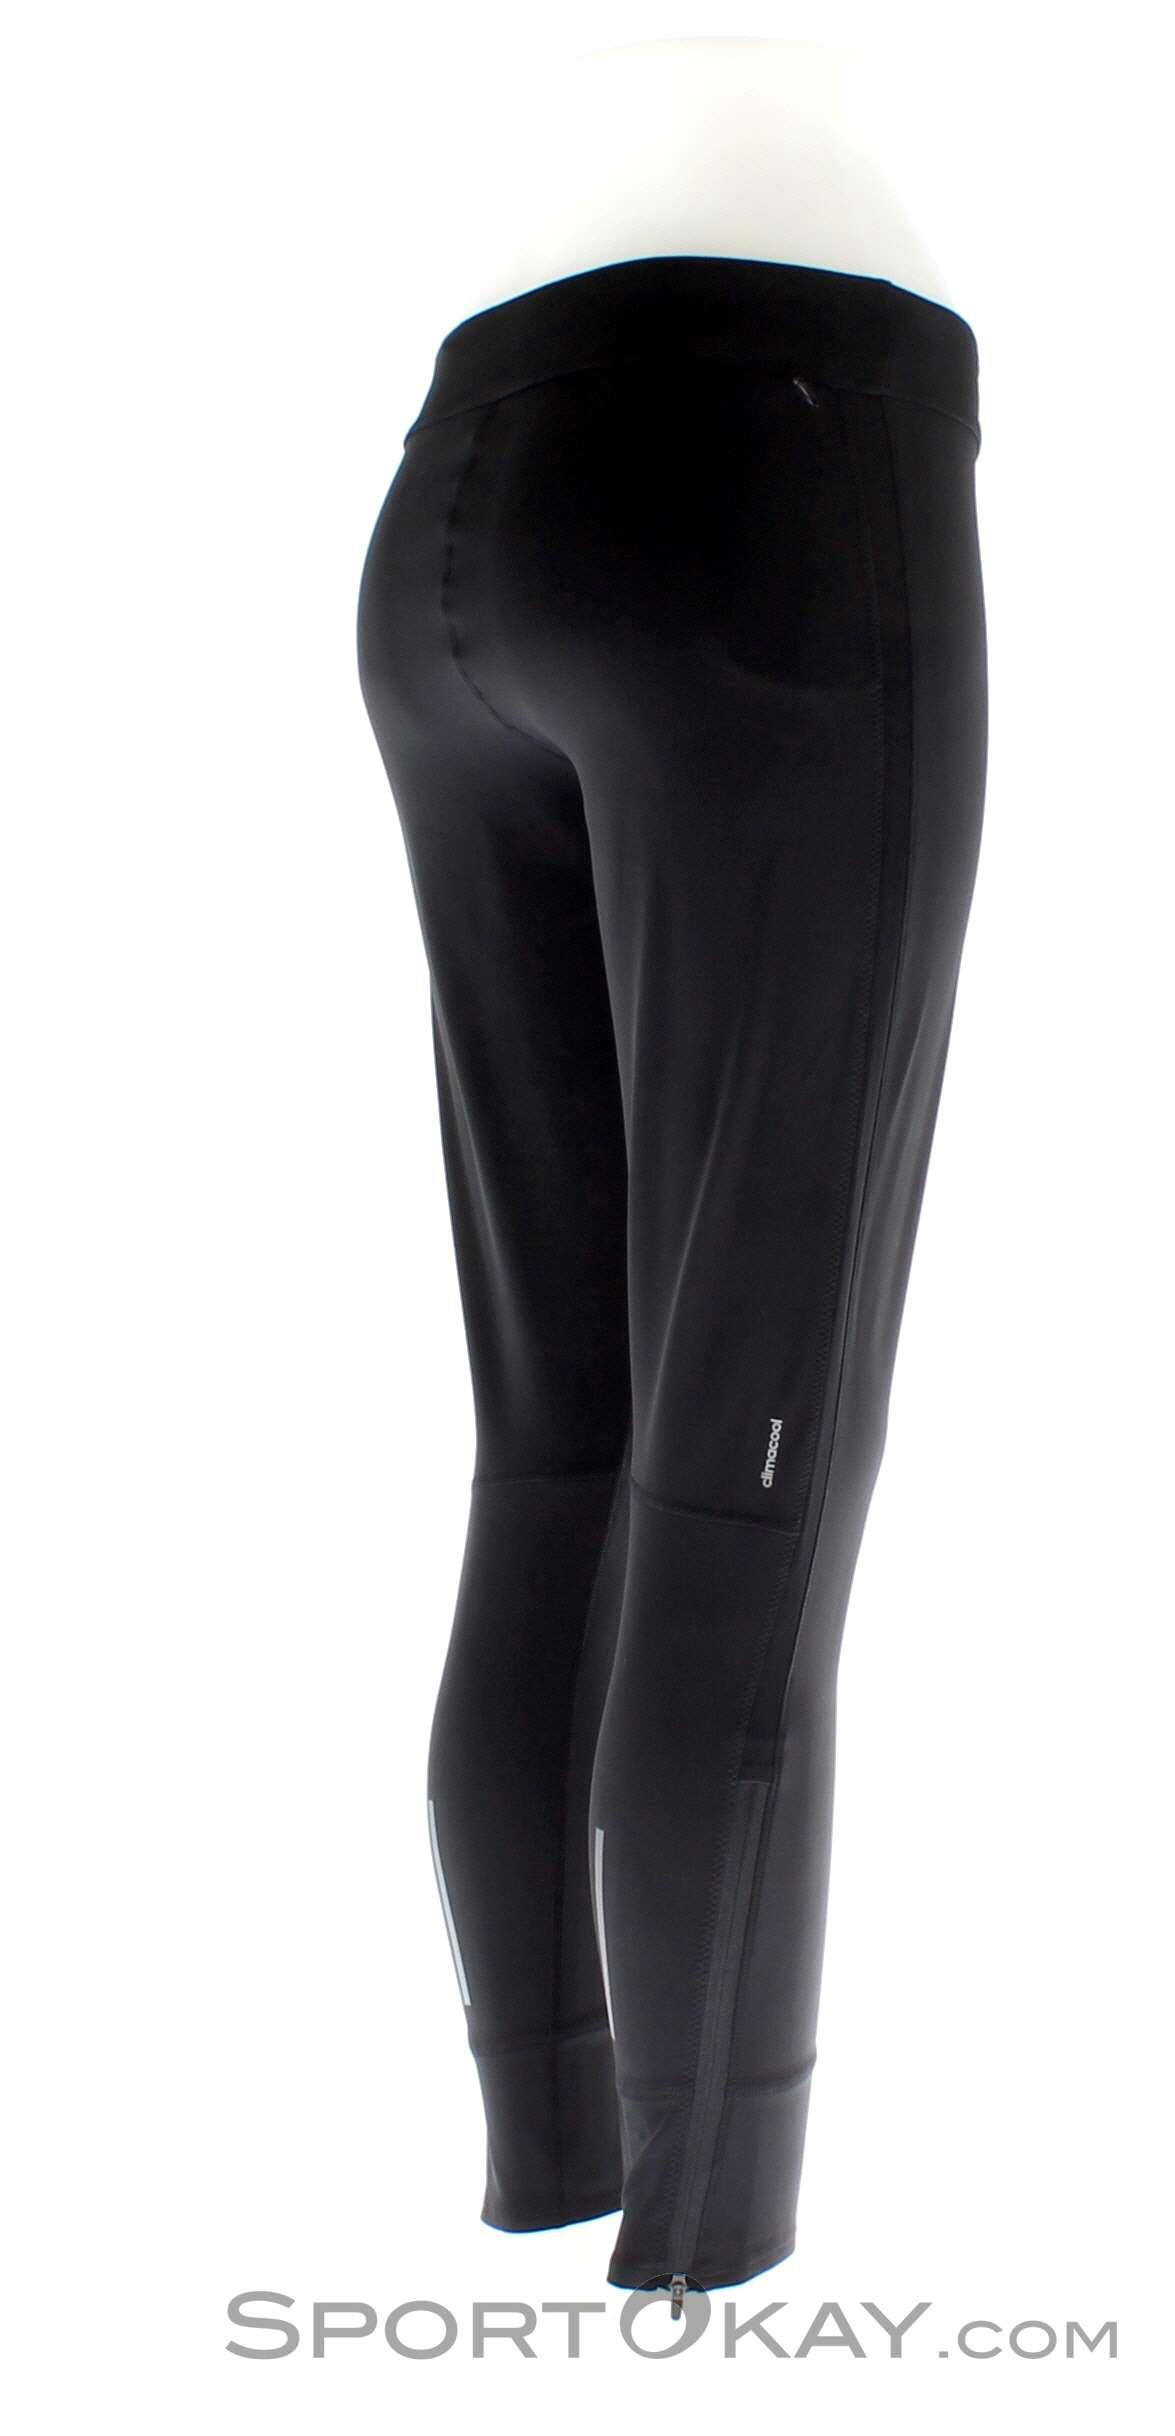 adidas Performance Trainingsanzug für Mädchen kHm0nyECA6jU4t